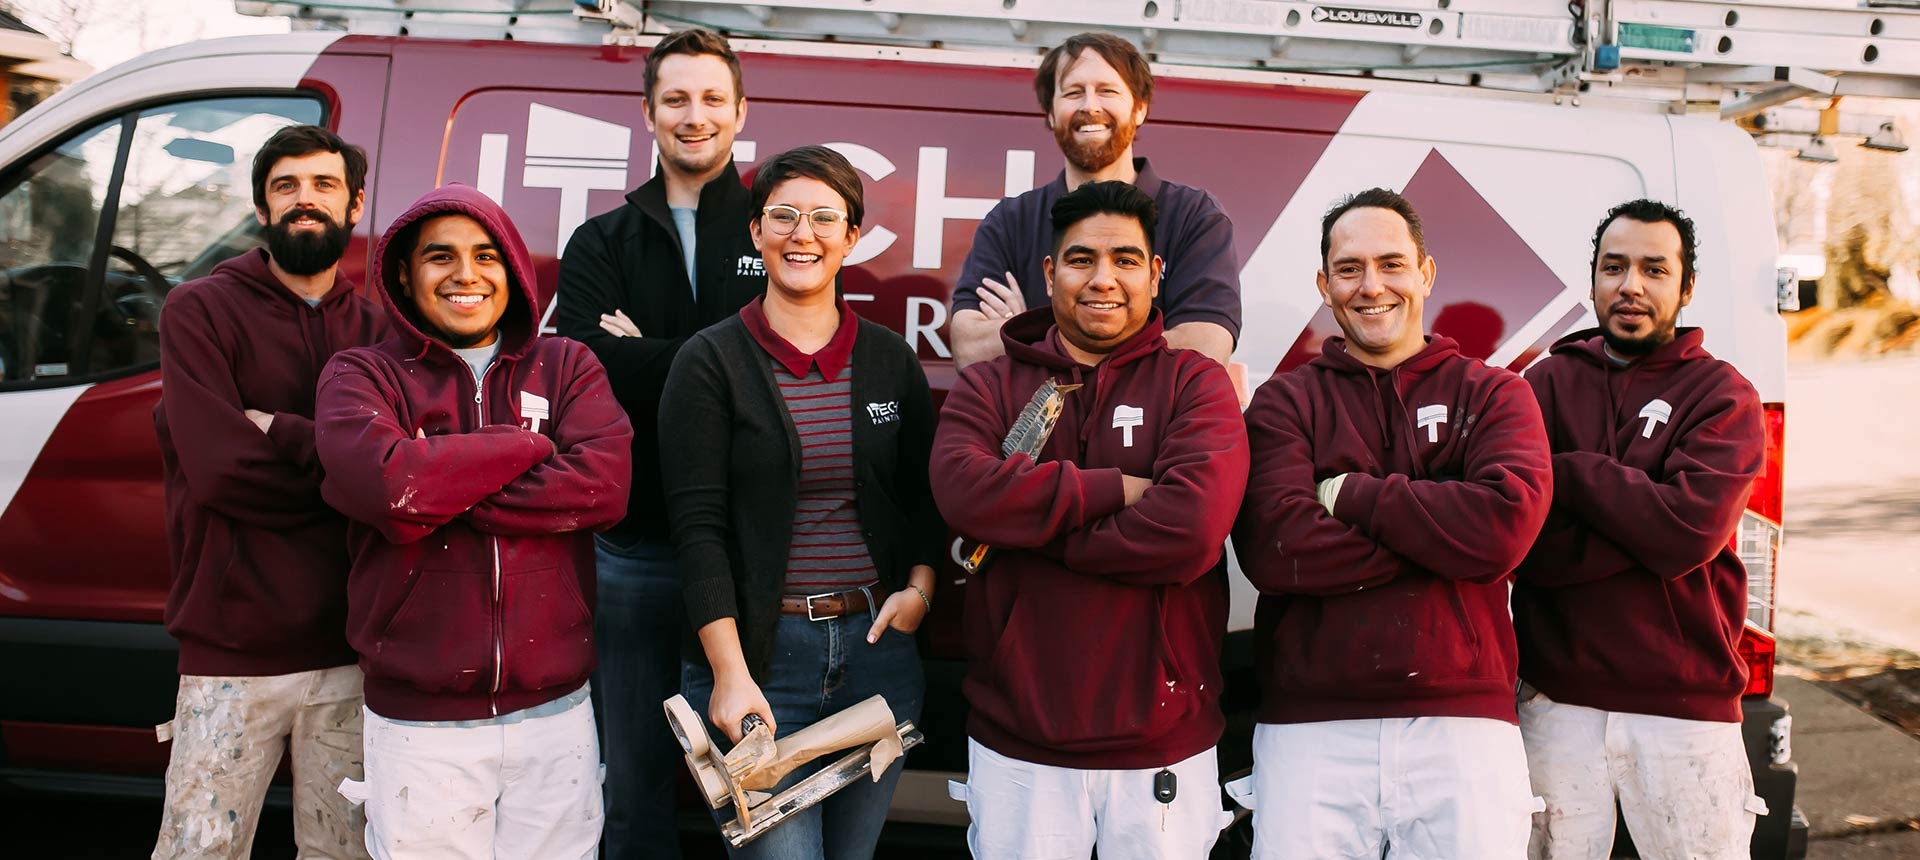 ITech Painters Team - Best Home Painters Portland Hillsboro Beaverton Gresham